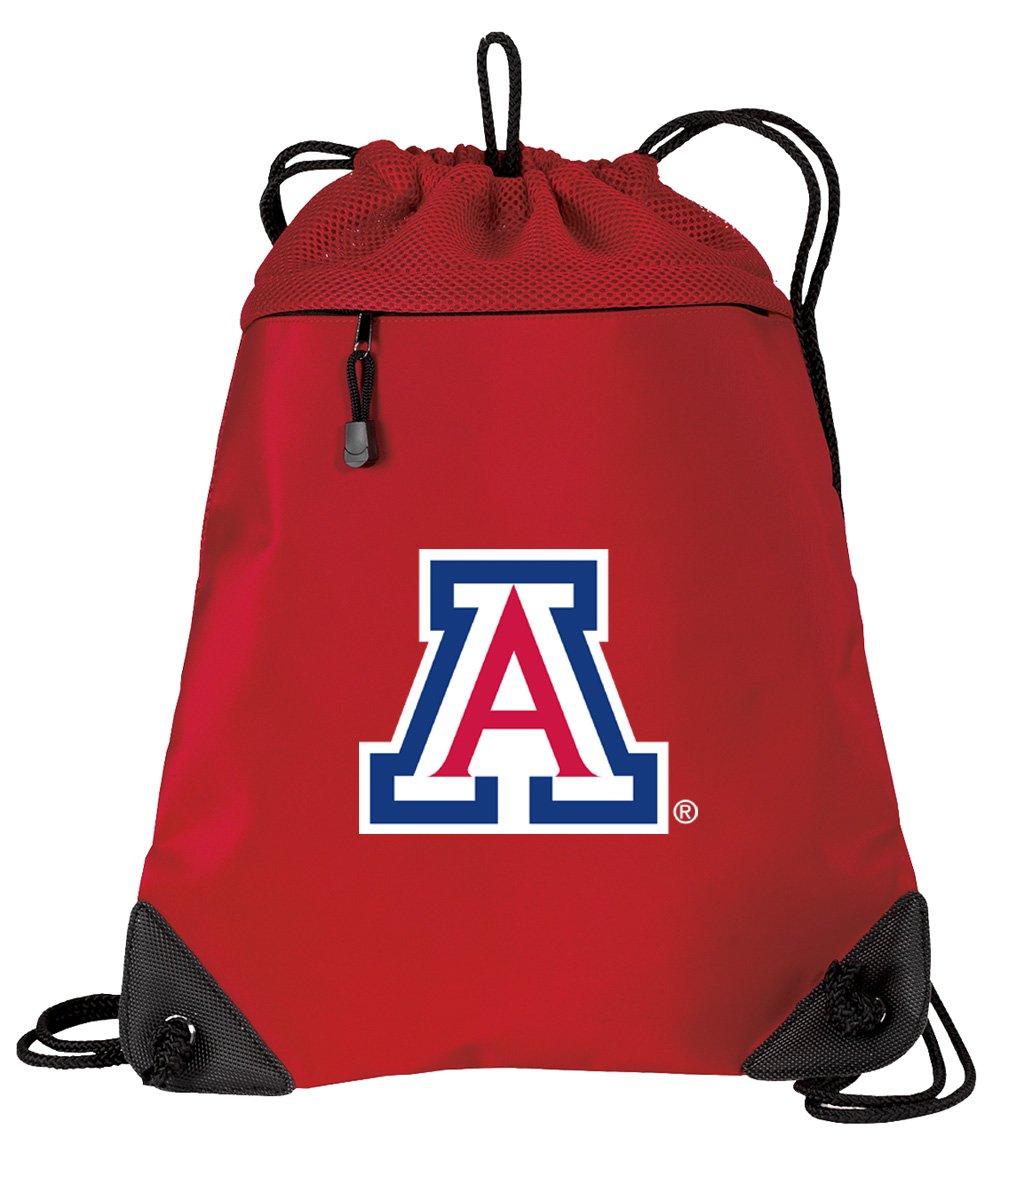 Broad Bay University of Arizona Drawstring Backpack Bag Arizona Wildcats Cinch Pack - UNIQUE MESH & MICROFIBER